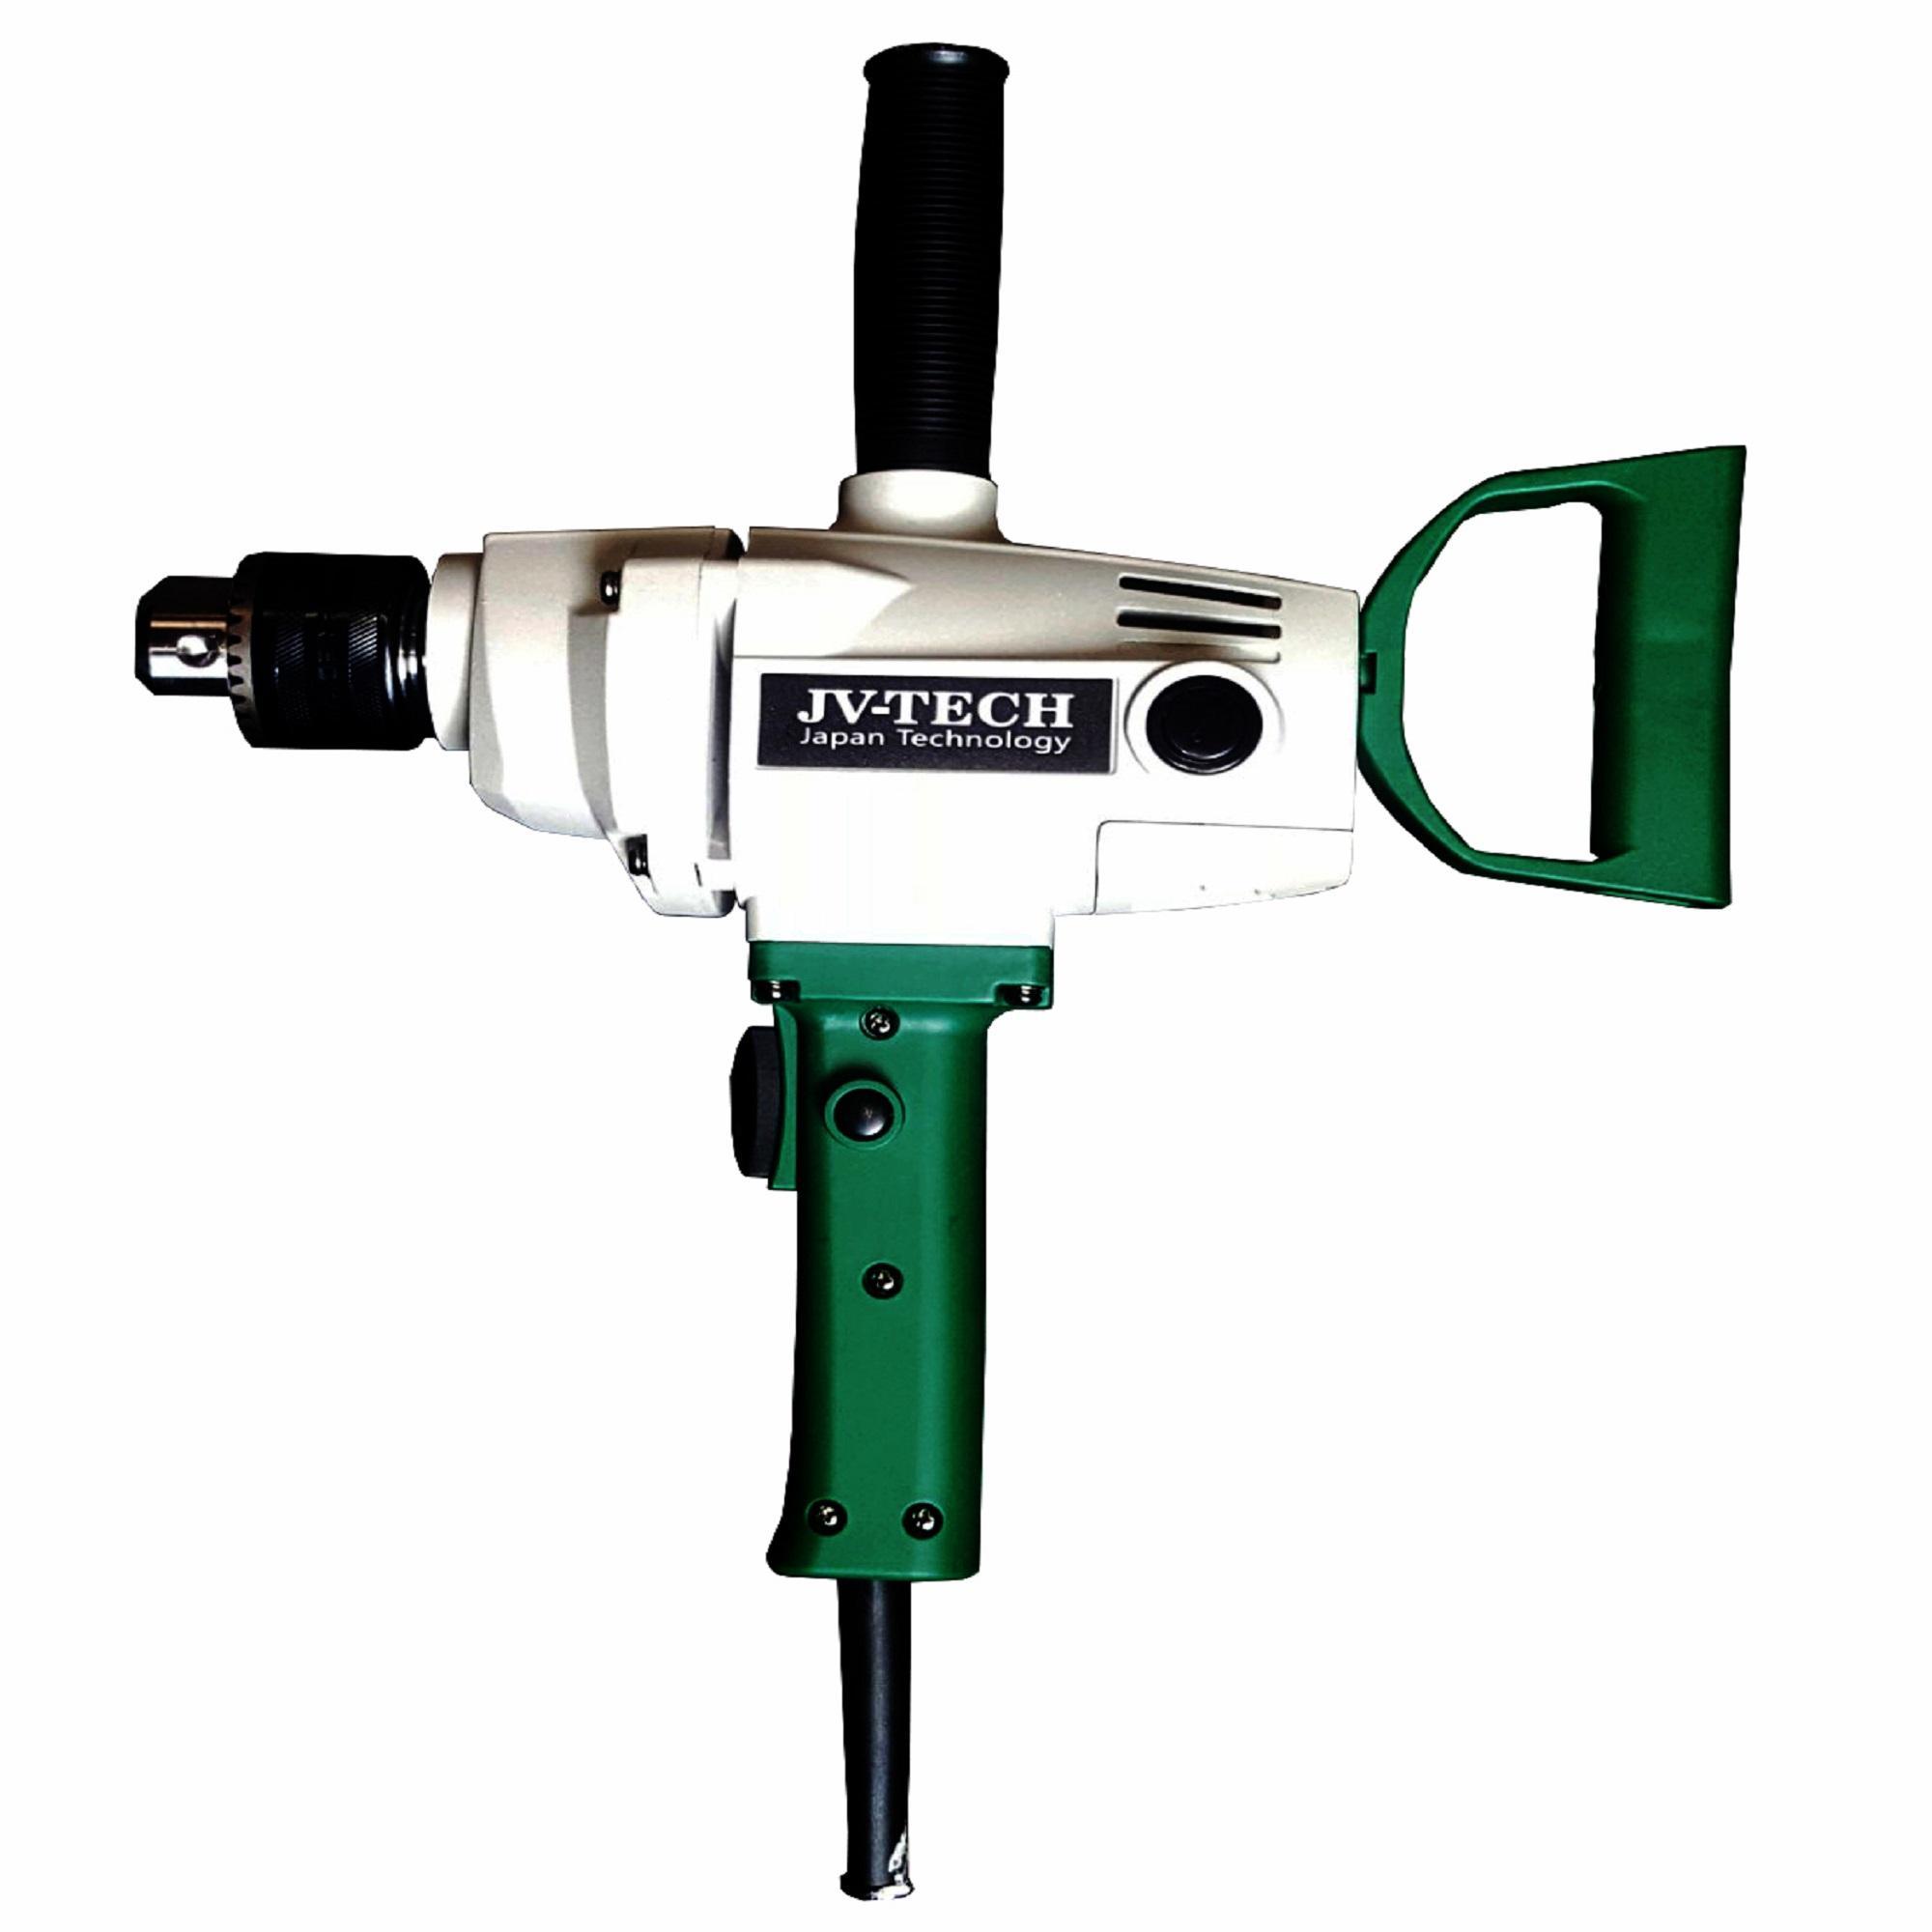 Máy khoan JV-TECH VT10136 16mm 850W